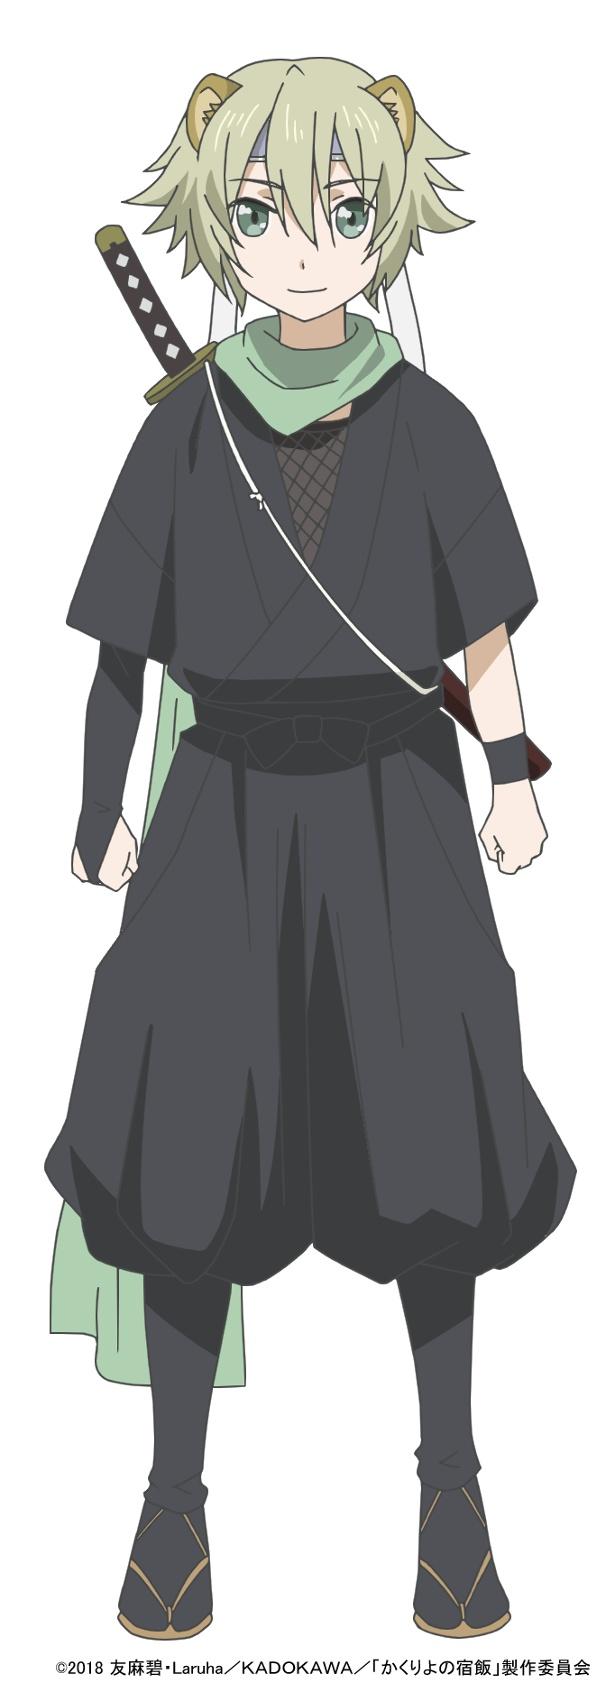 TVアニメ「かくりよの宿飯」最新情報が公開!追加キャストに中恵光城・井上雄貴が決定!